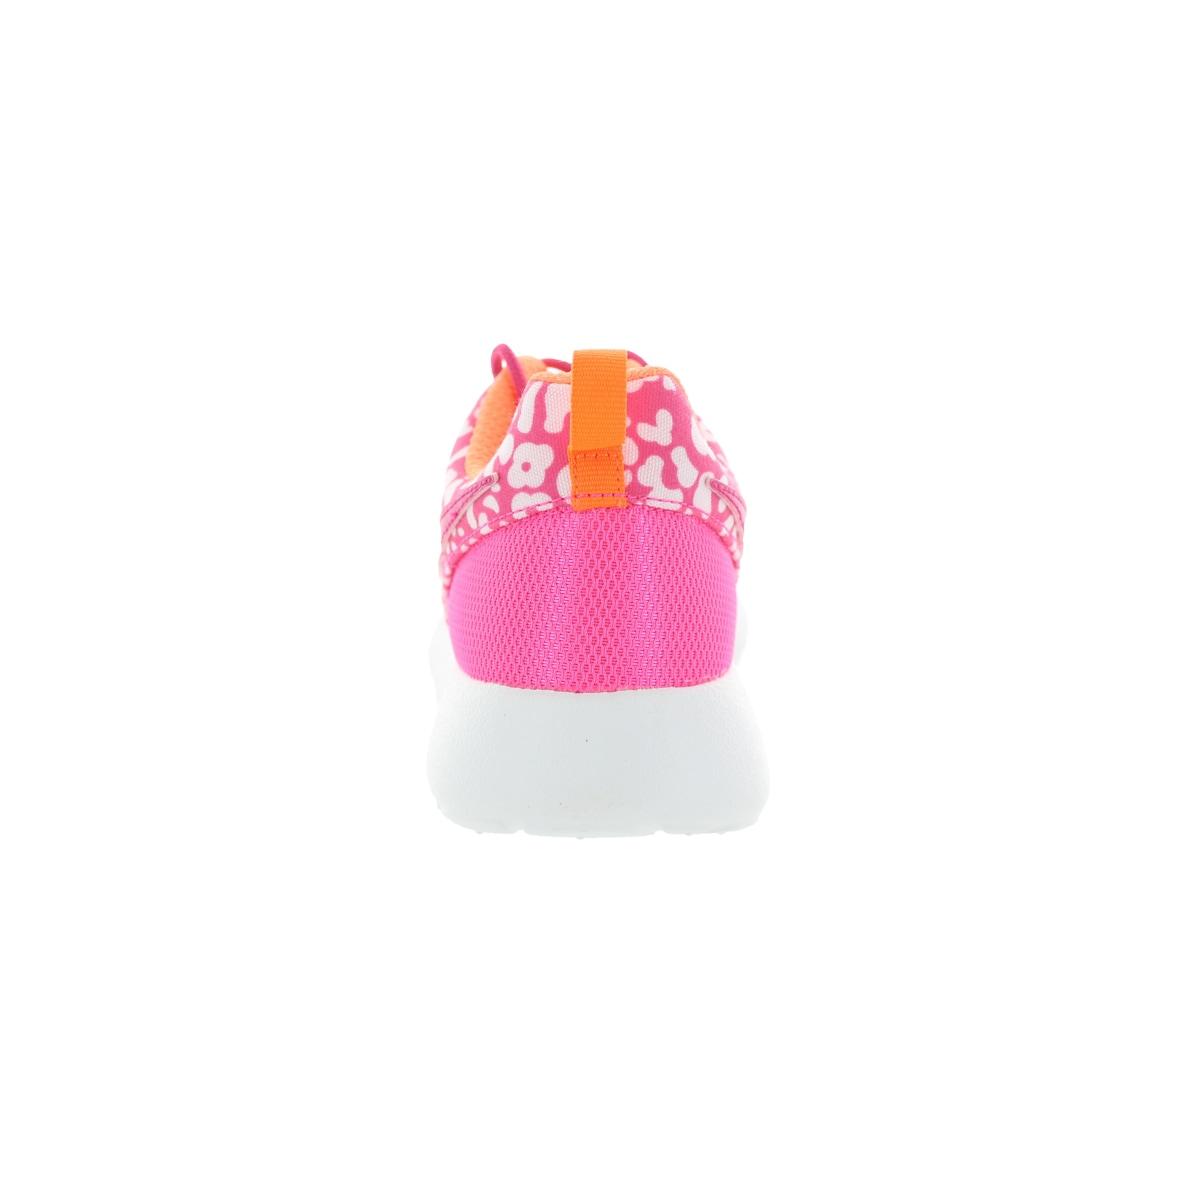 f6e6c0e9e163 Shop Nike Kids Roshe One Print (Gs) Pink Pow Vvd Pink Orange White Running  Shoe - Free Shipping Today - Overstock - 12330601